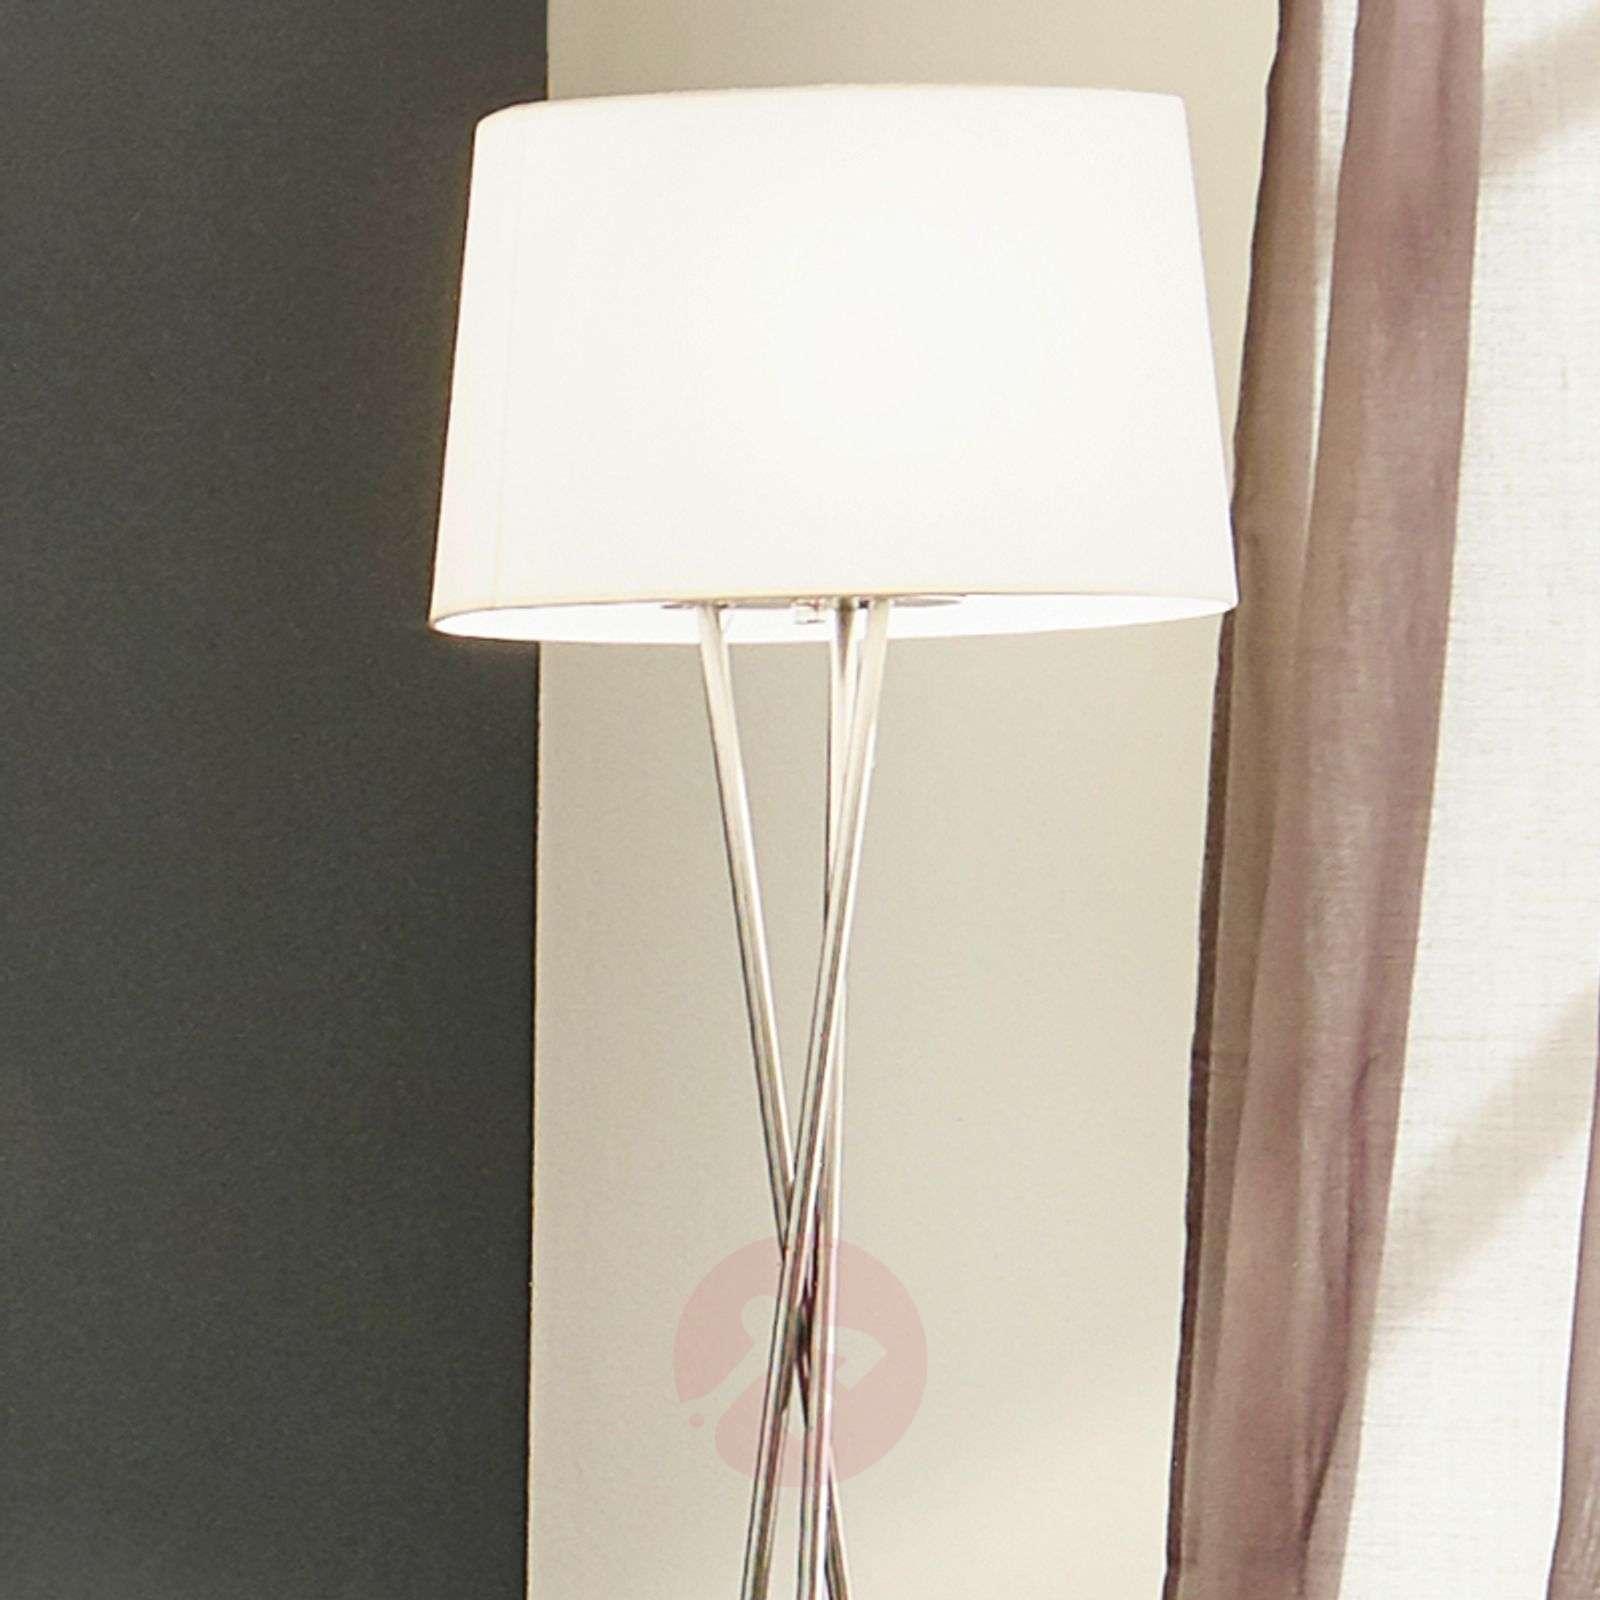 Belora Floor lamp with Fabric Shade-3031556-02